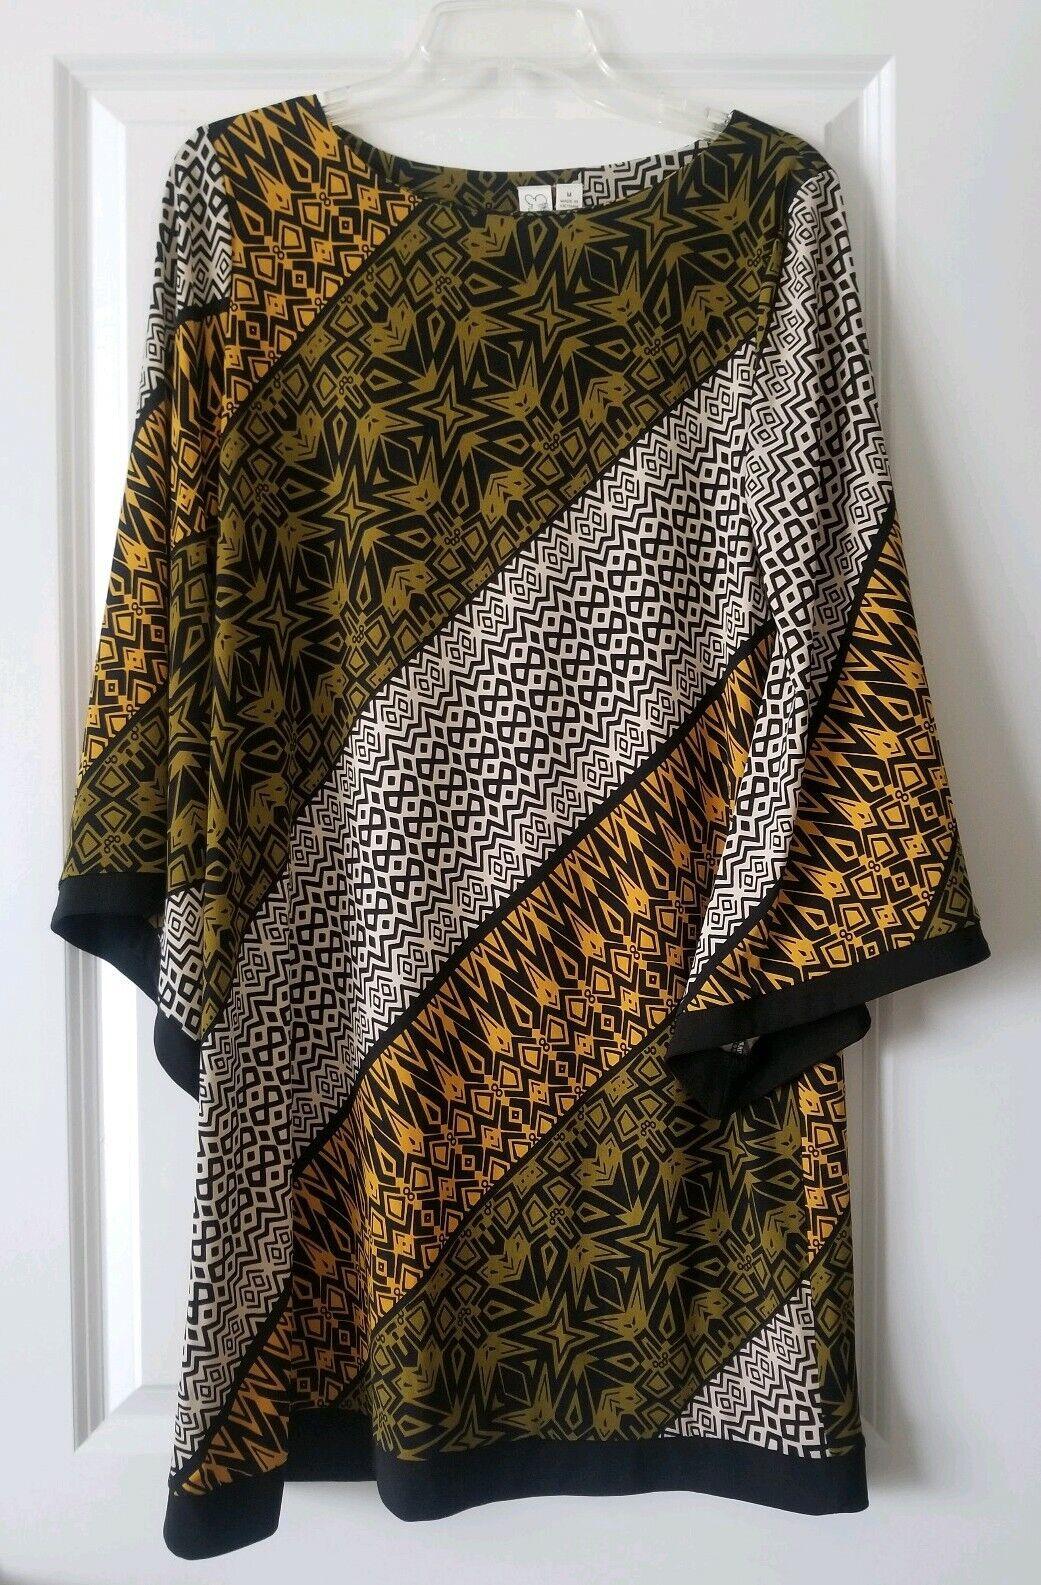 EM-42052-BlackMulti-M Floral Print Stretch Lace Dress Fabric